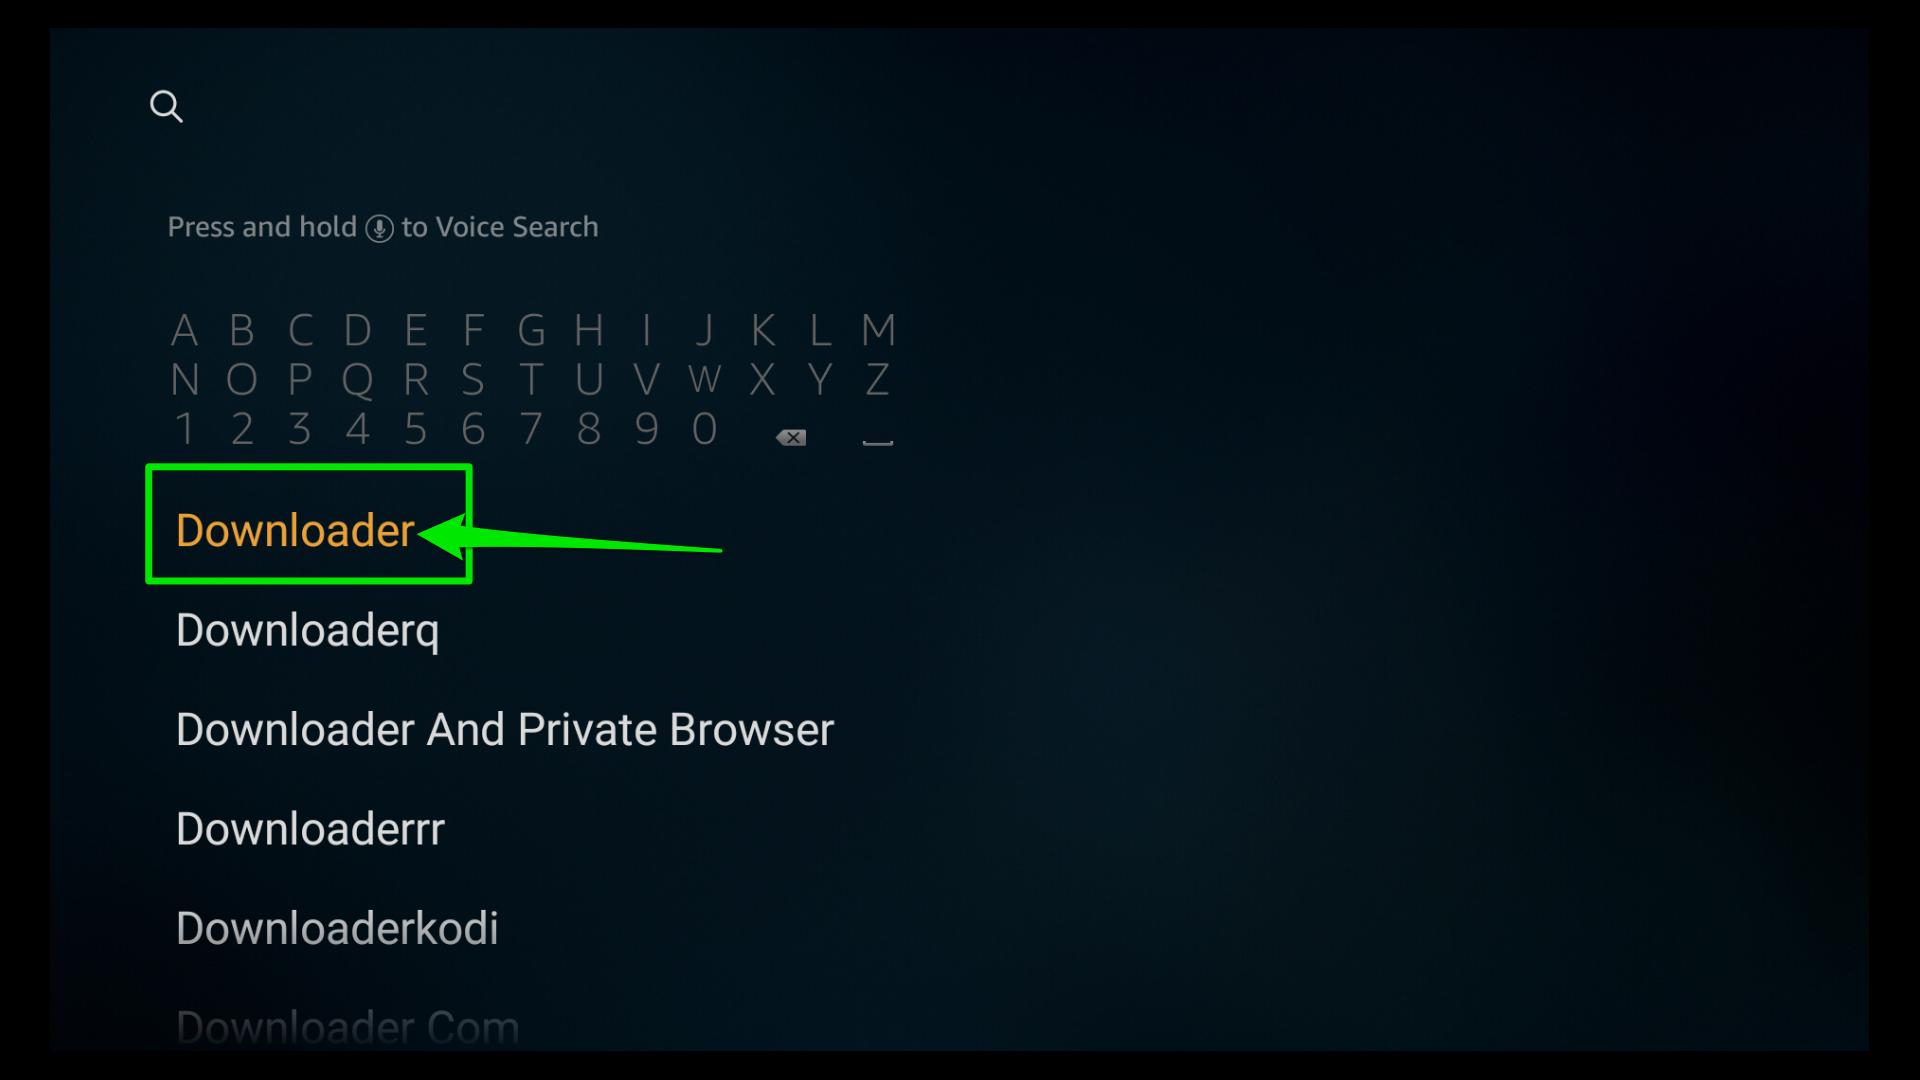 How To Download Ipvanish For Firestick